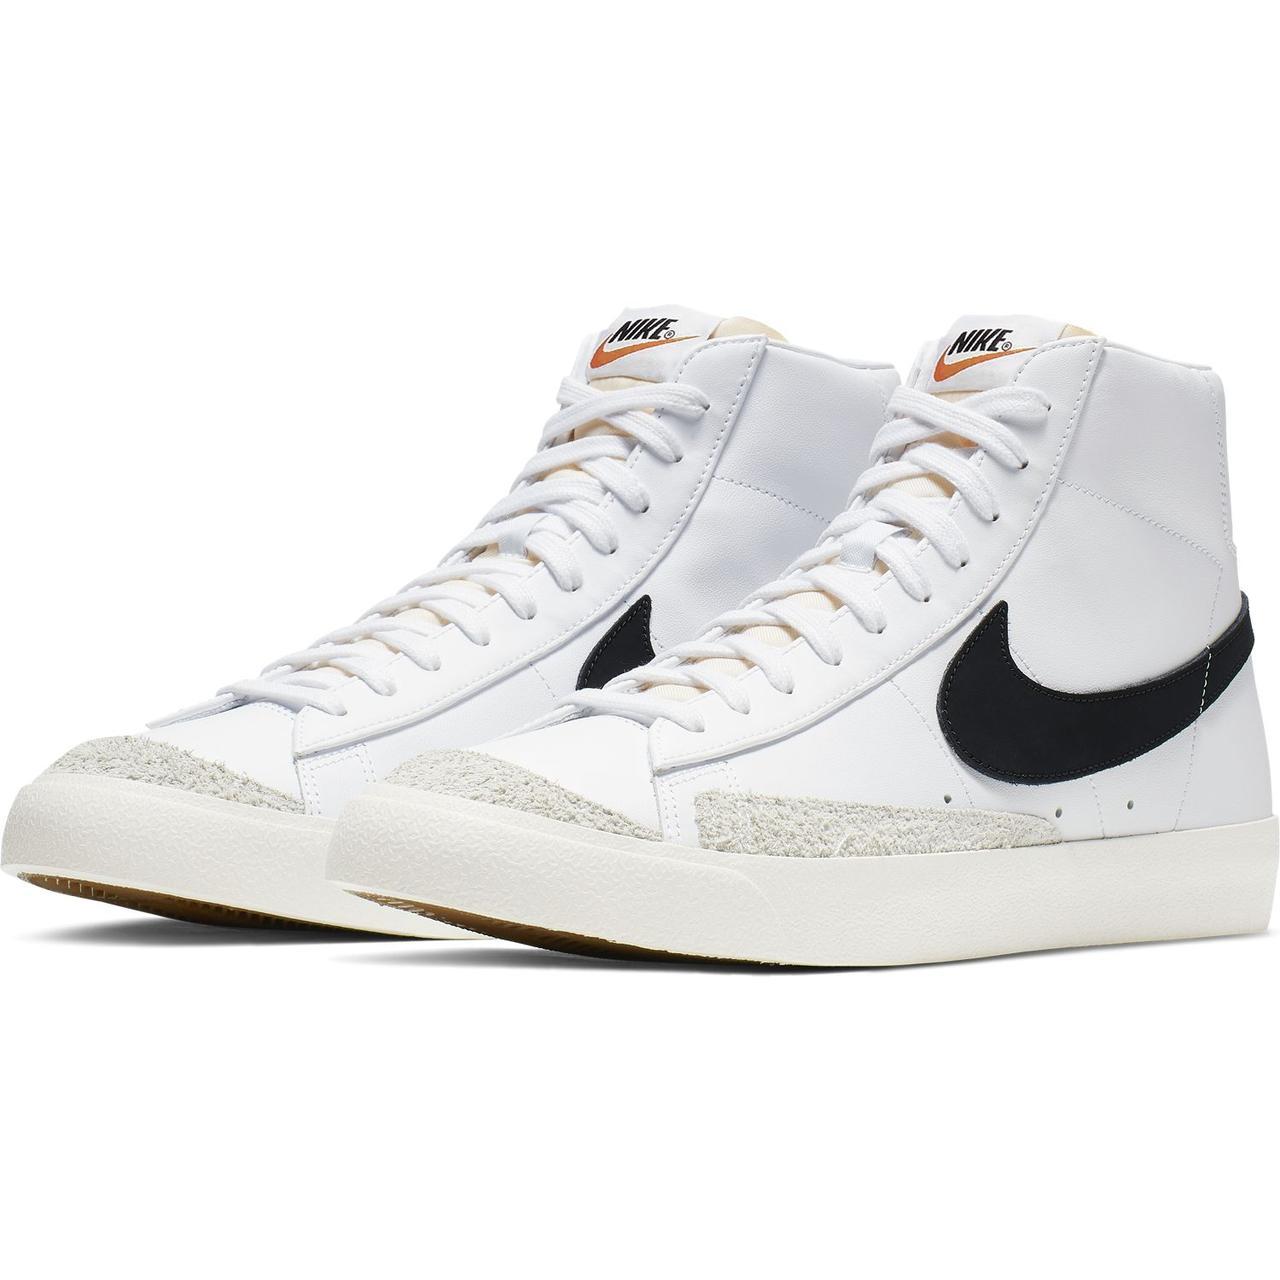 Кроссовки мужские Nike Blazer Mid '77 Vintage BQ6806-100 Белый